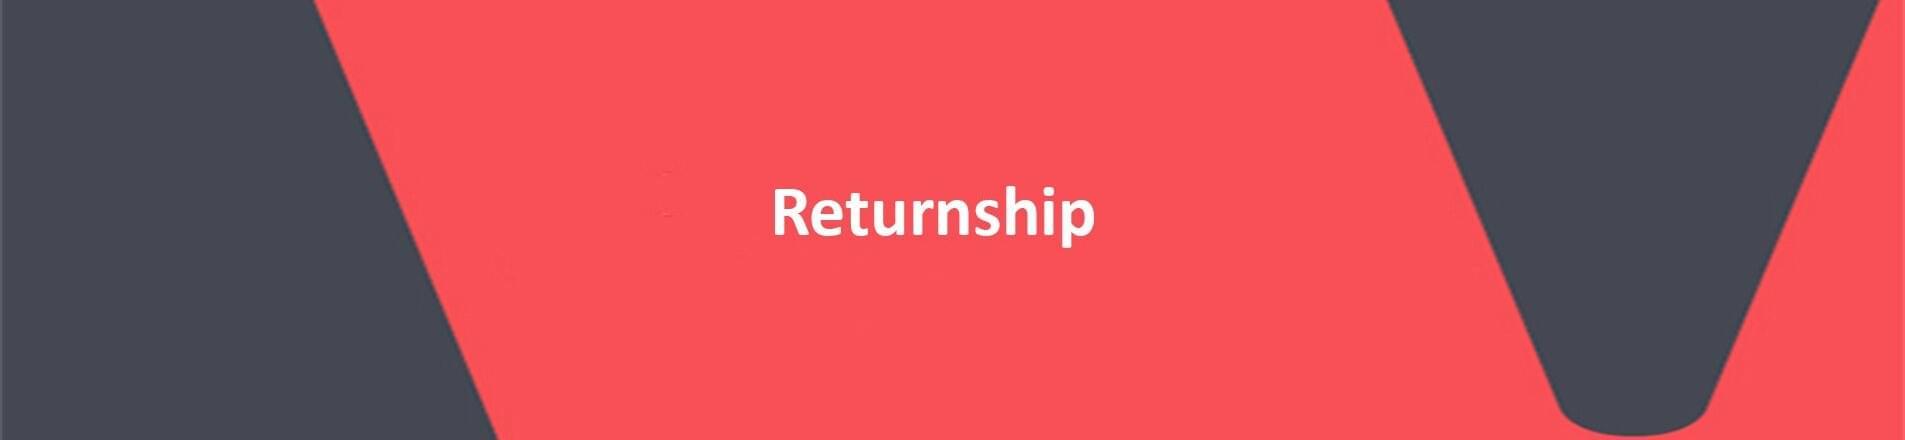 Returnship.